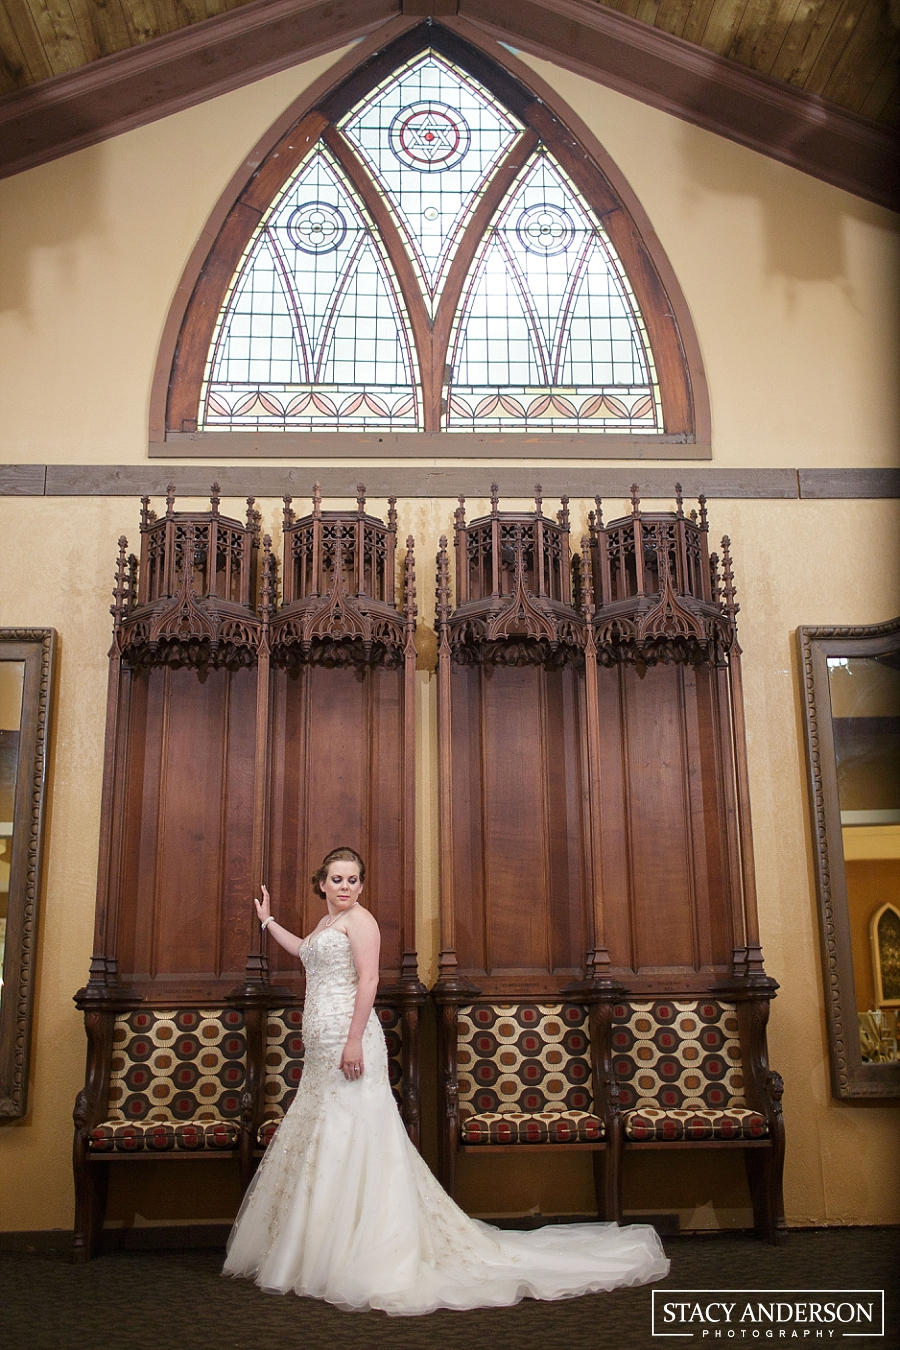 Stacy Anderson Photography Heaven on Earth Wedding Photographer_1710